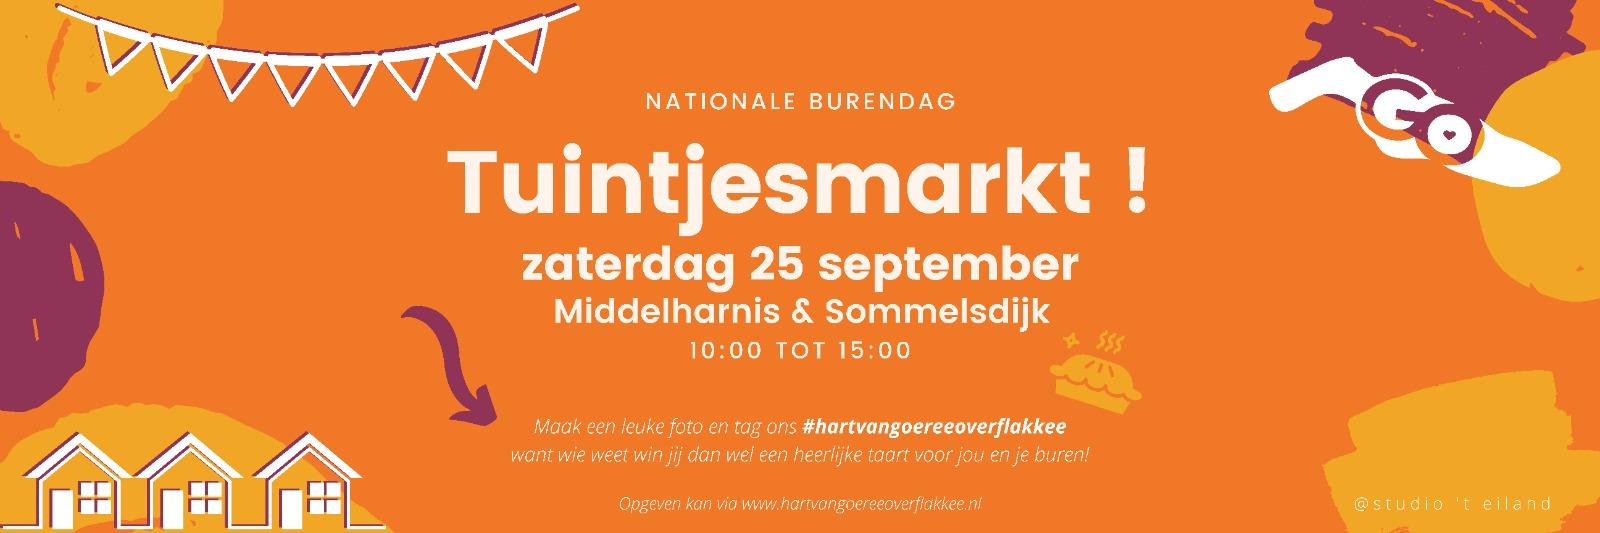 Banner Tuintjesmarkt 2021